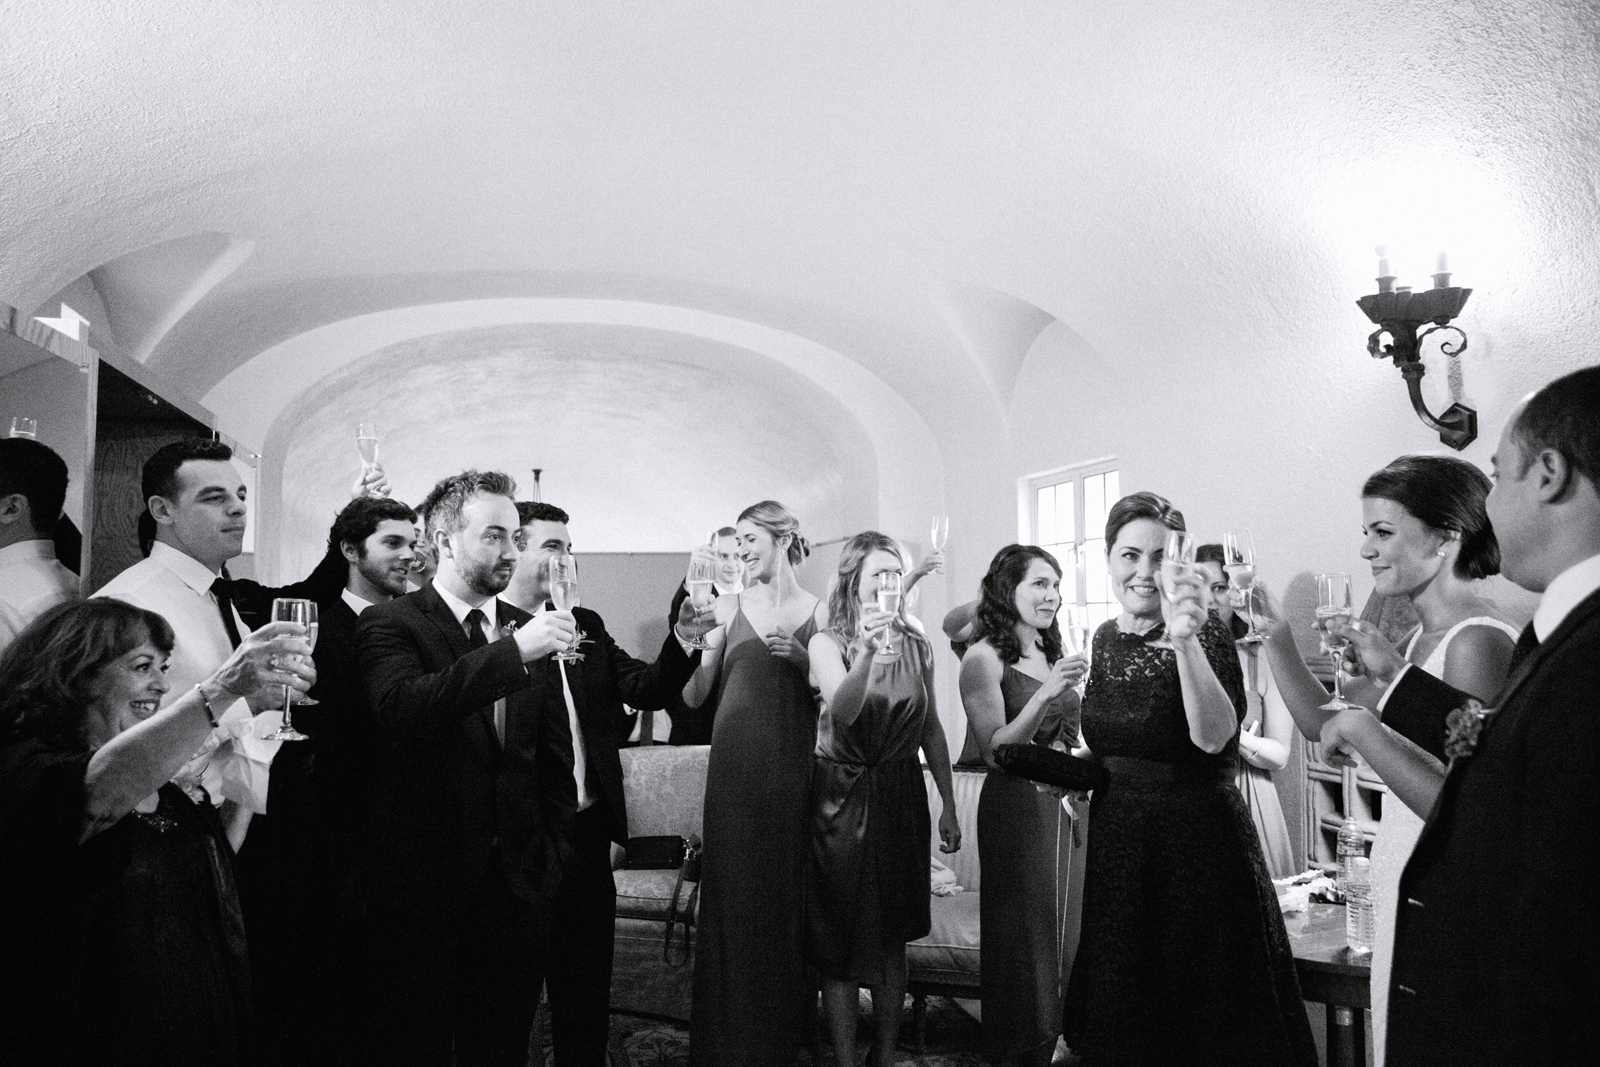 temple_emmanuel_jewish_wedding_san_francisco_ca_sarah_andrew_ebony_siovhan_bokeh_photography_43.jpg